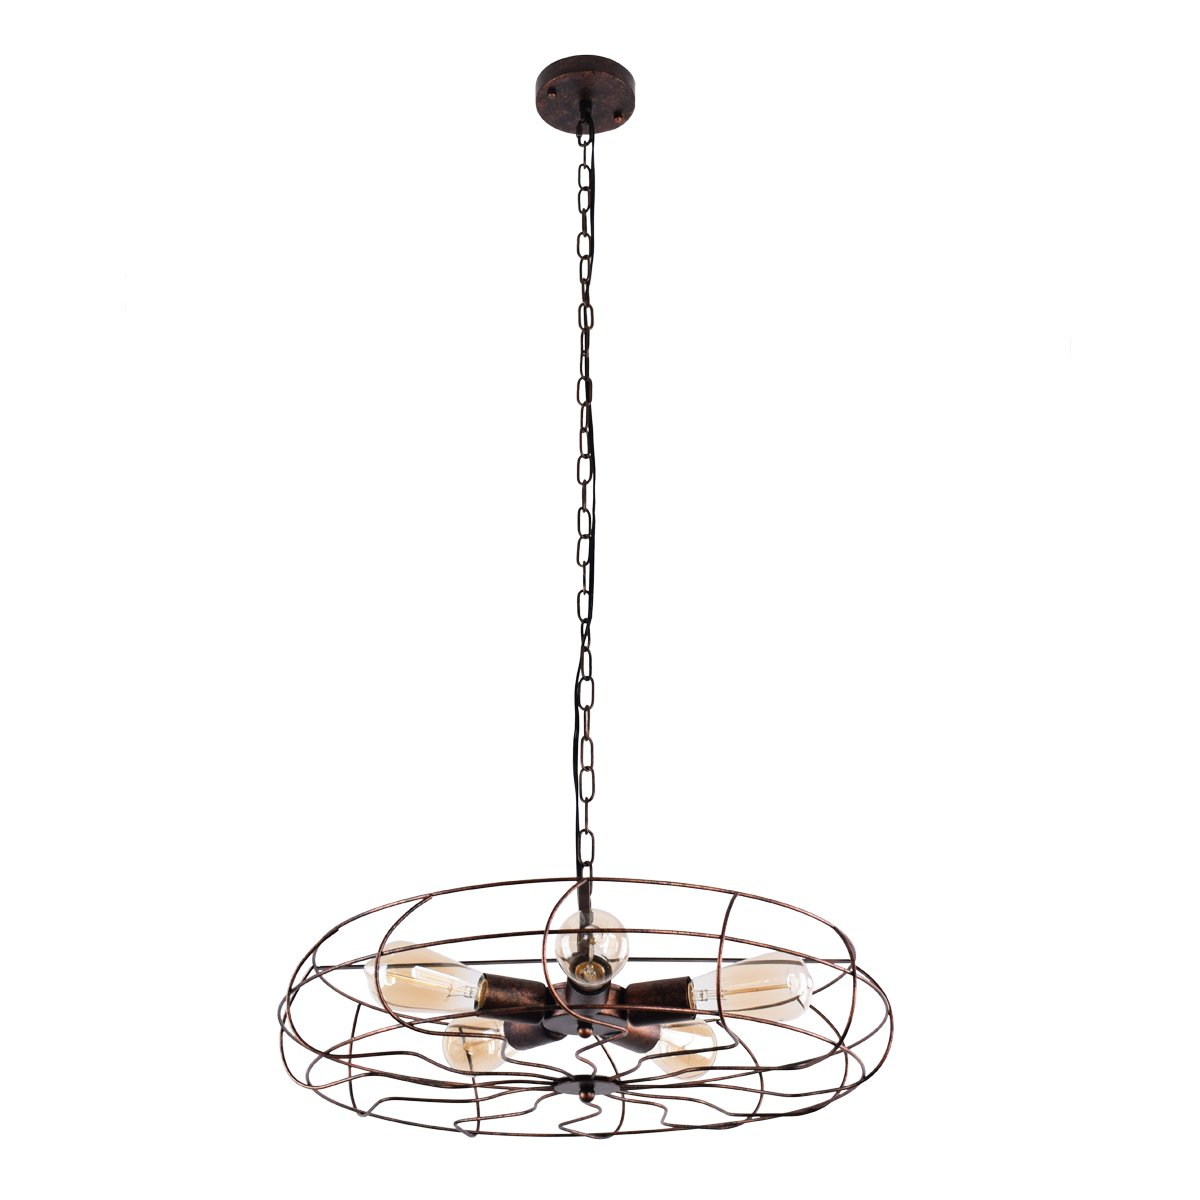 Lingkai Industrial Pendant Light Retro Ceiling Light Vintage Fan Style 5-Light Chandelier Hanging Light Fixture YL000163R